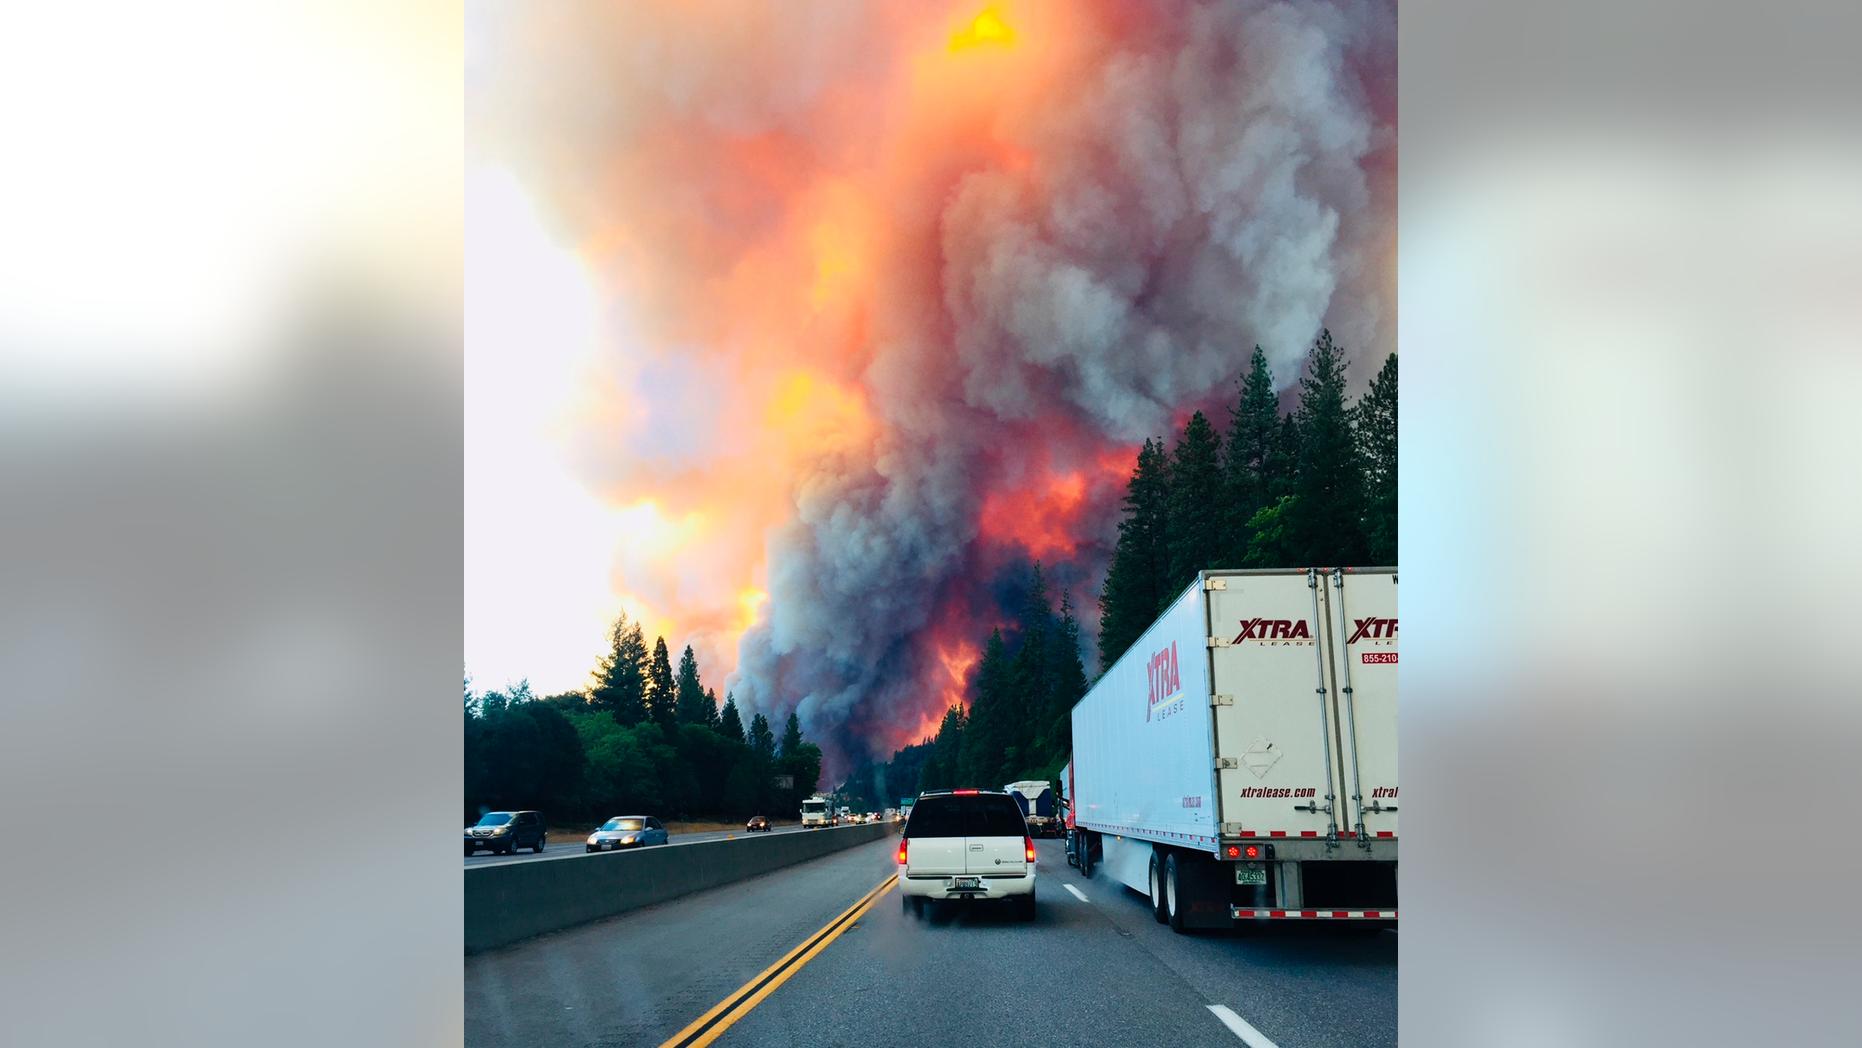 A fire rages as motorists travel on Interstate 5 near Lake Shasta, Calif., Wednesday, Sept. 5, 2018. (Jerri Tubbs via AP)